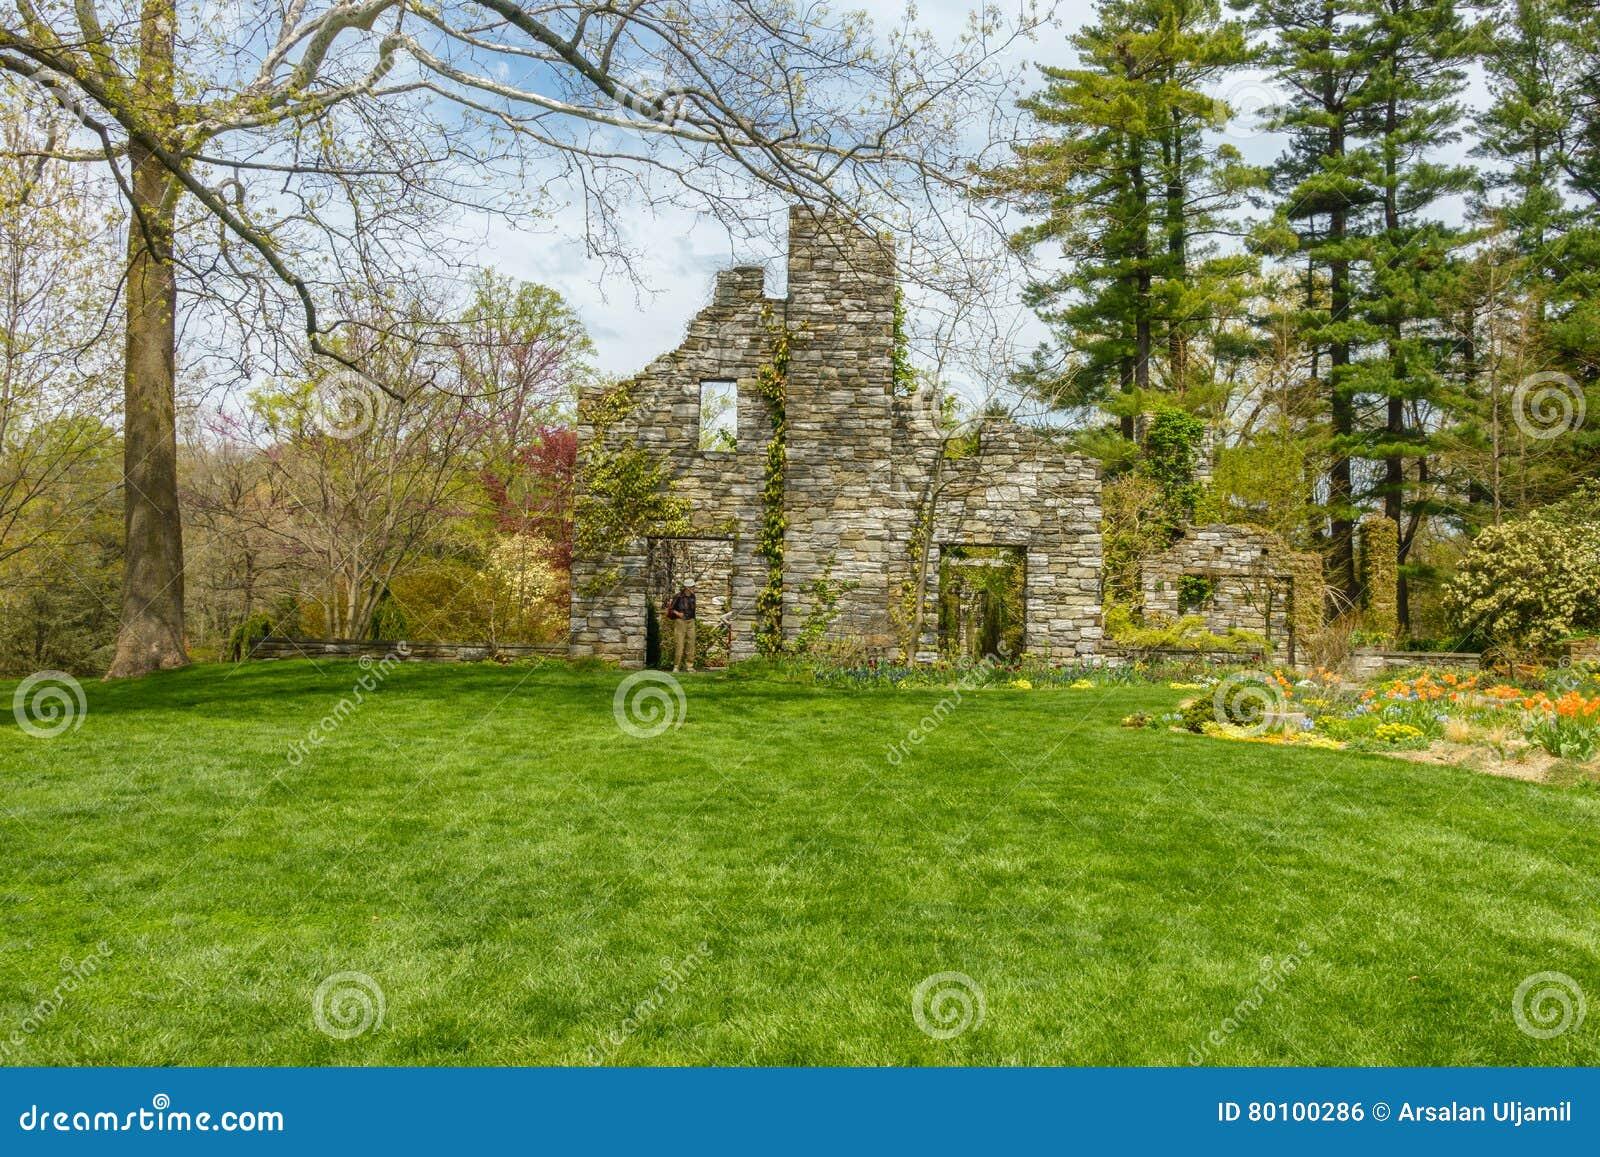 Jardim verde luxúria com estrutura de pedra